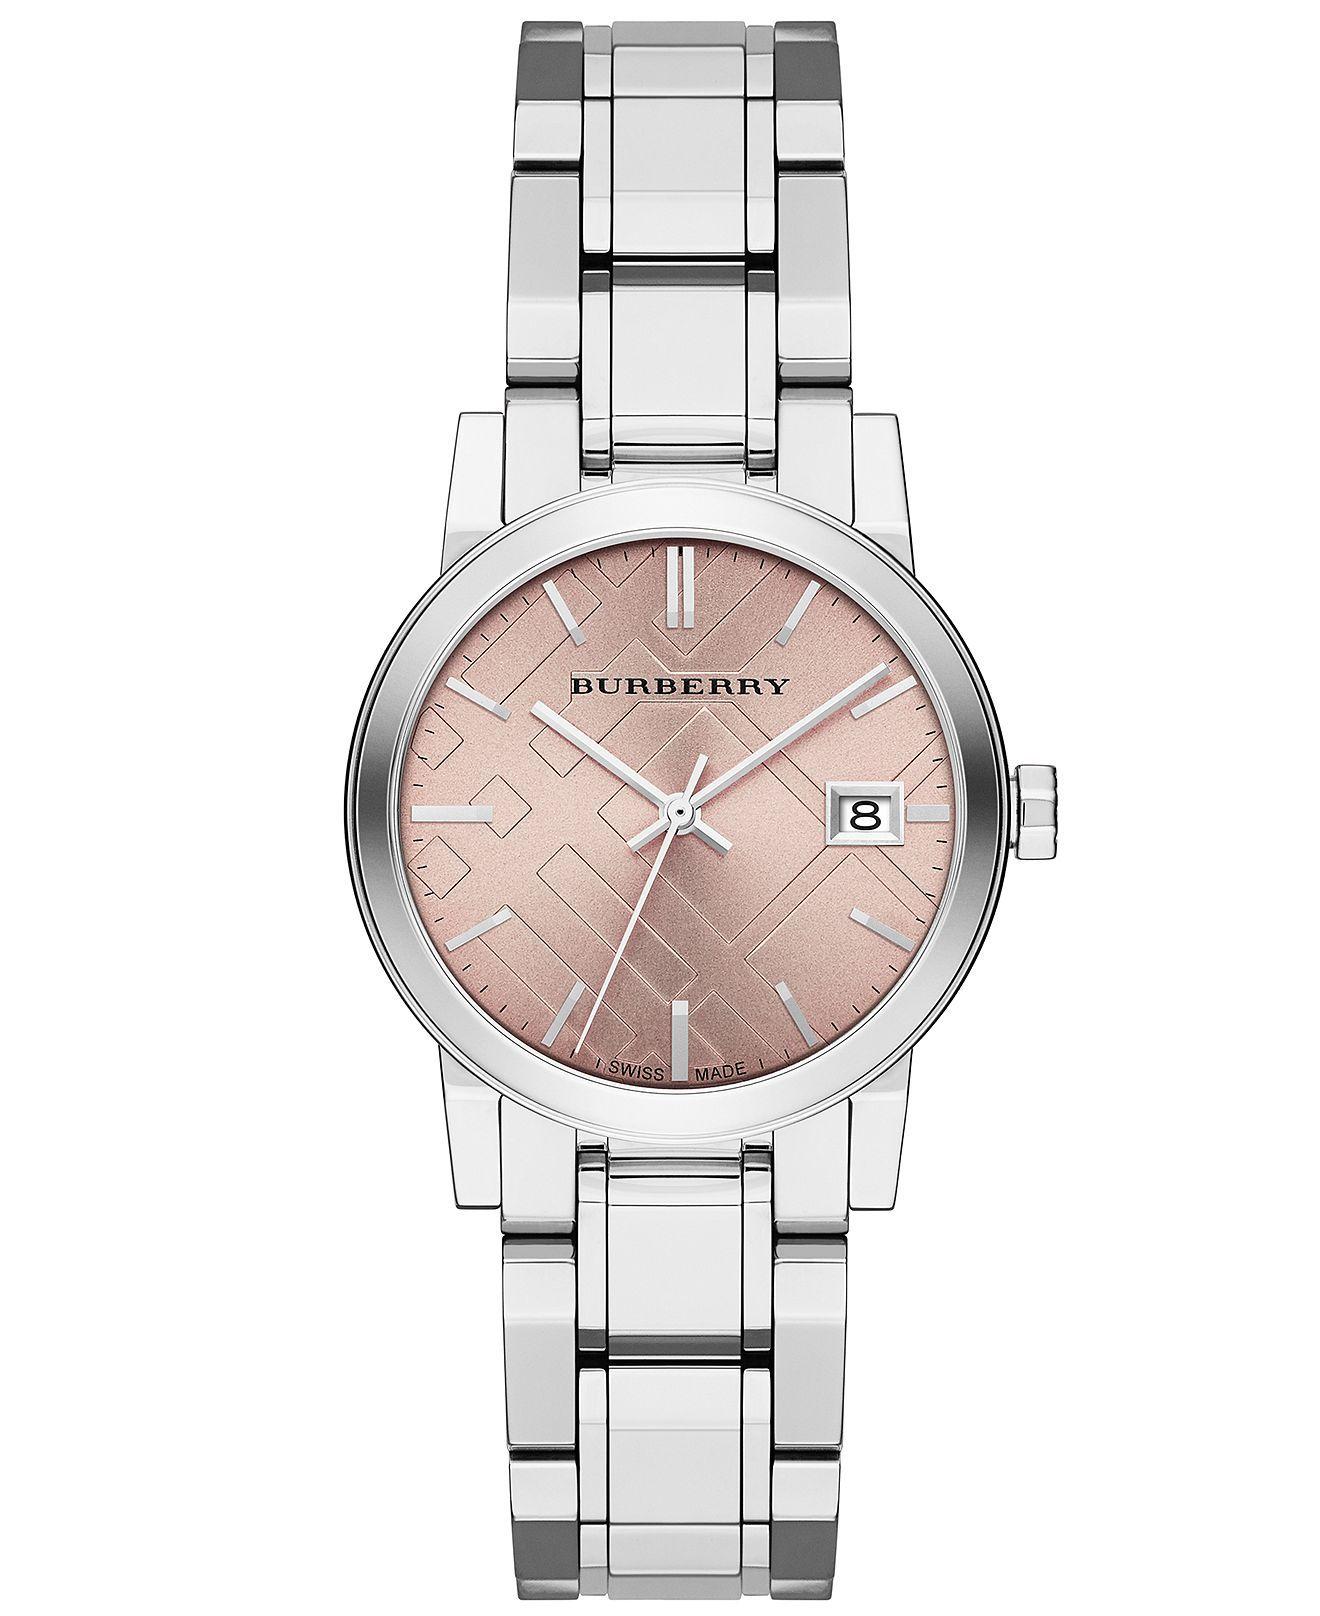 Burberry Watch 492fffbb99